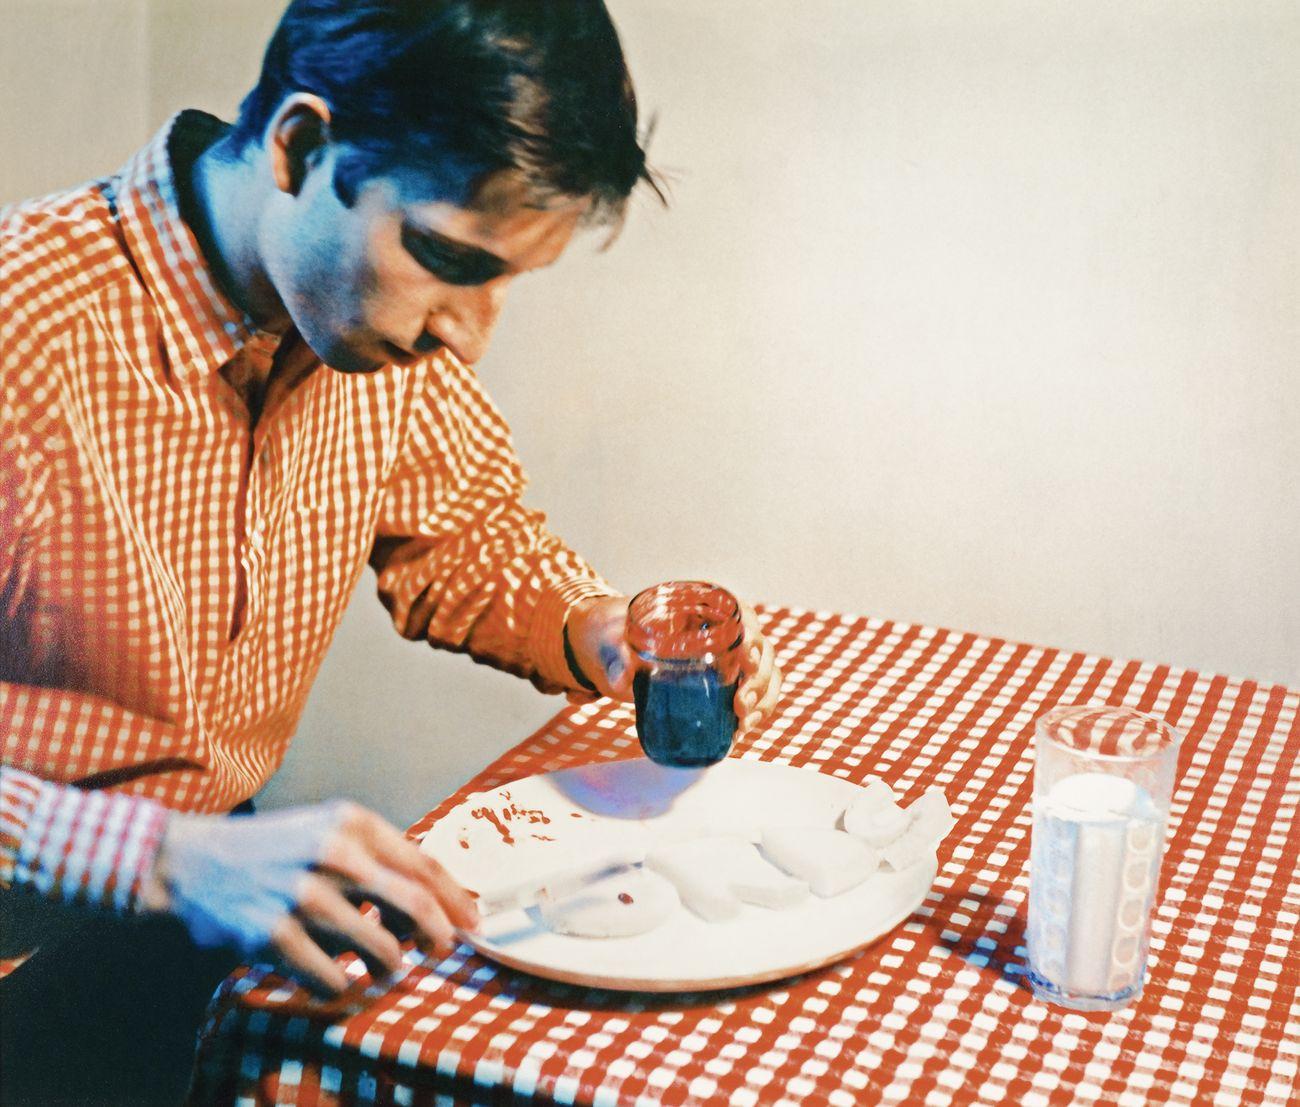 Bruce Nauman, Eating My Words, dal portfolio Eleven Color Photographs, 1966-67-1970-2007. Museum of Contemporary Art Chicago. Photo Nathan Keay © MCA Chicago © Bruce Nauman - 2018, ProLitteris, Zurich